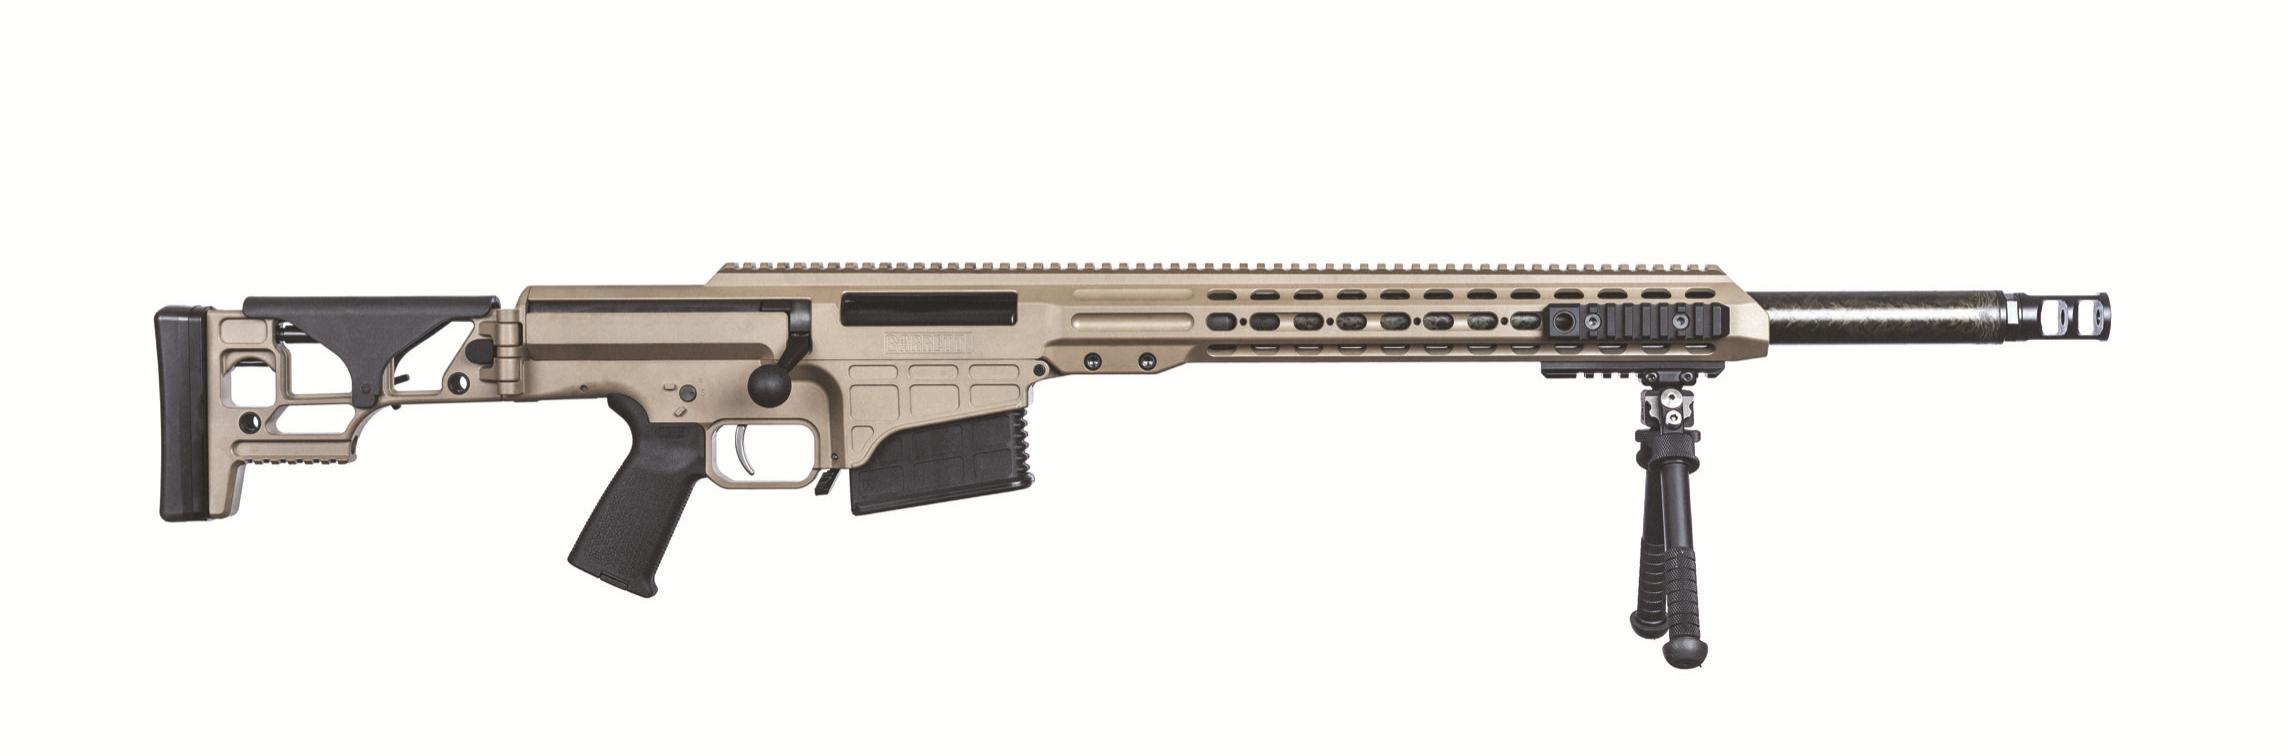 PROOF Research's Carbon Fiber Barrels Integral to New 300 PRC MRAD® Barrett Rifles Contracted by US Department of Defense